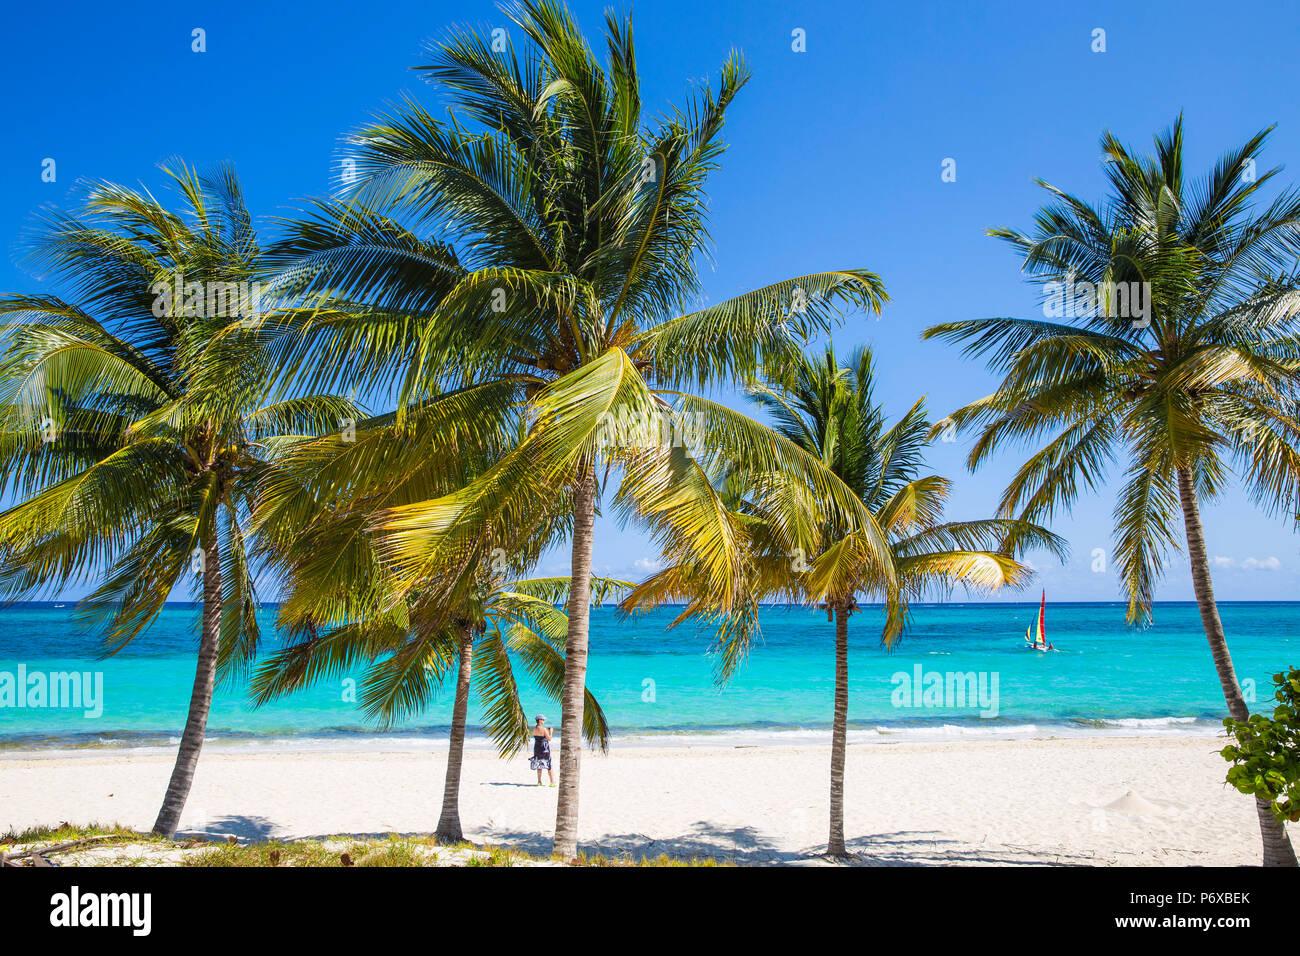 Cuba, Holguín, Playa Esmeralda Photo Stock